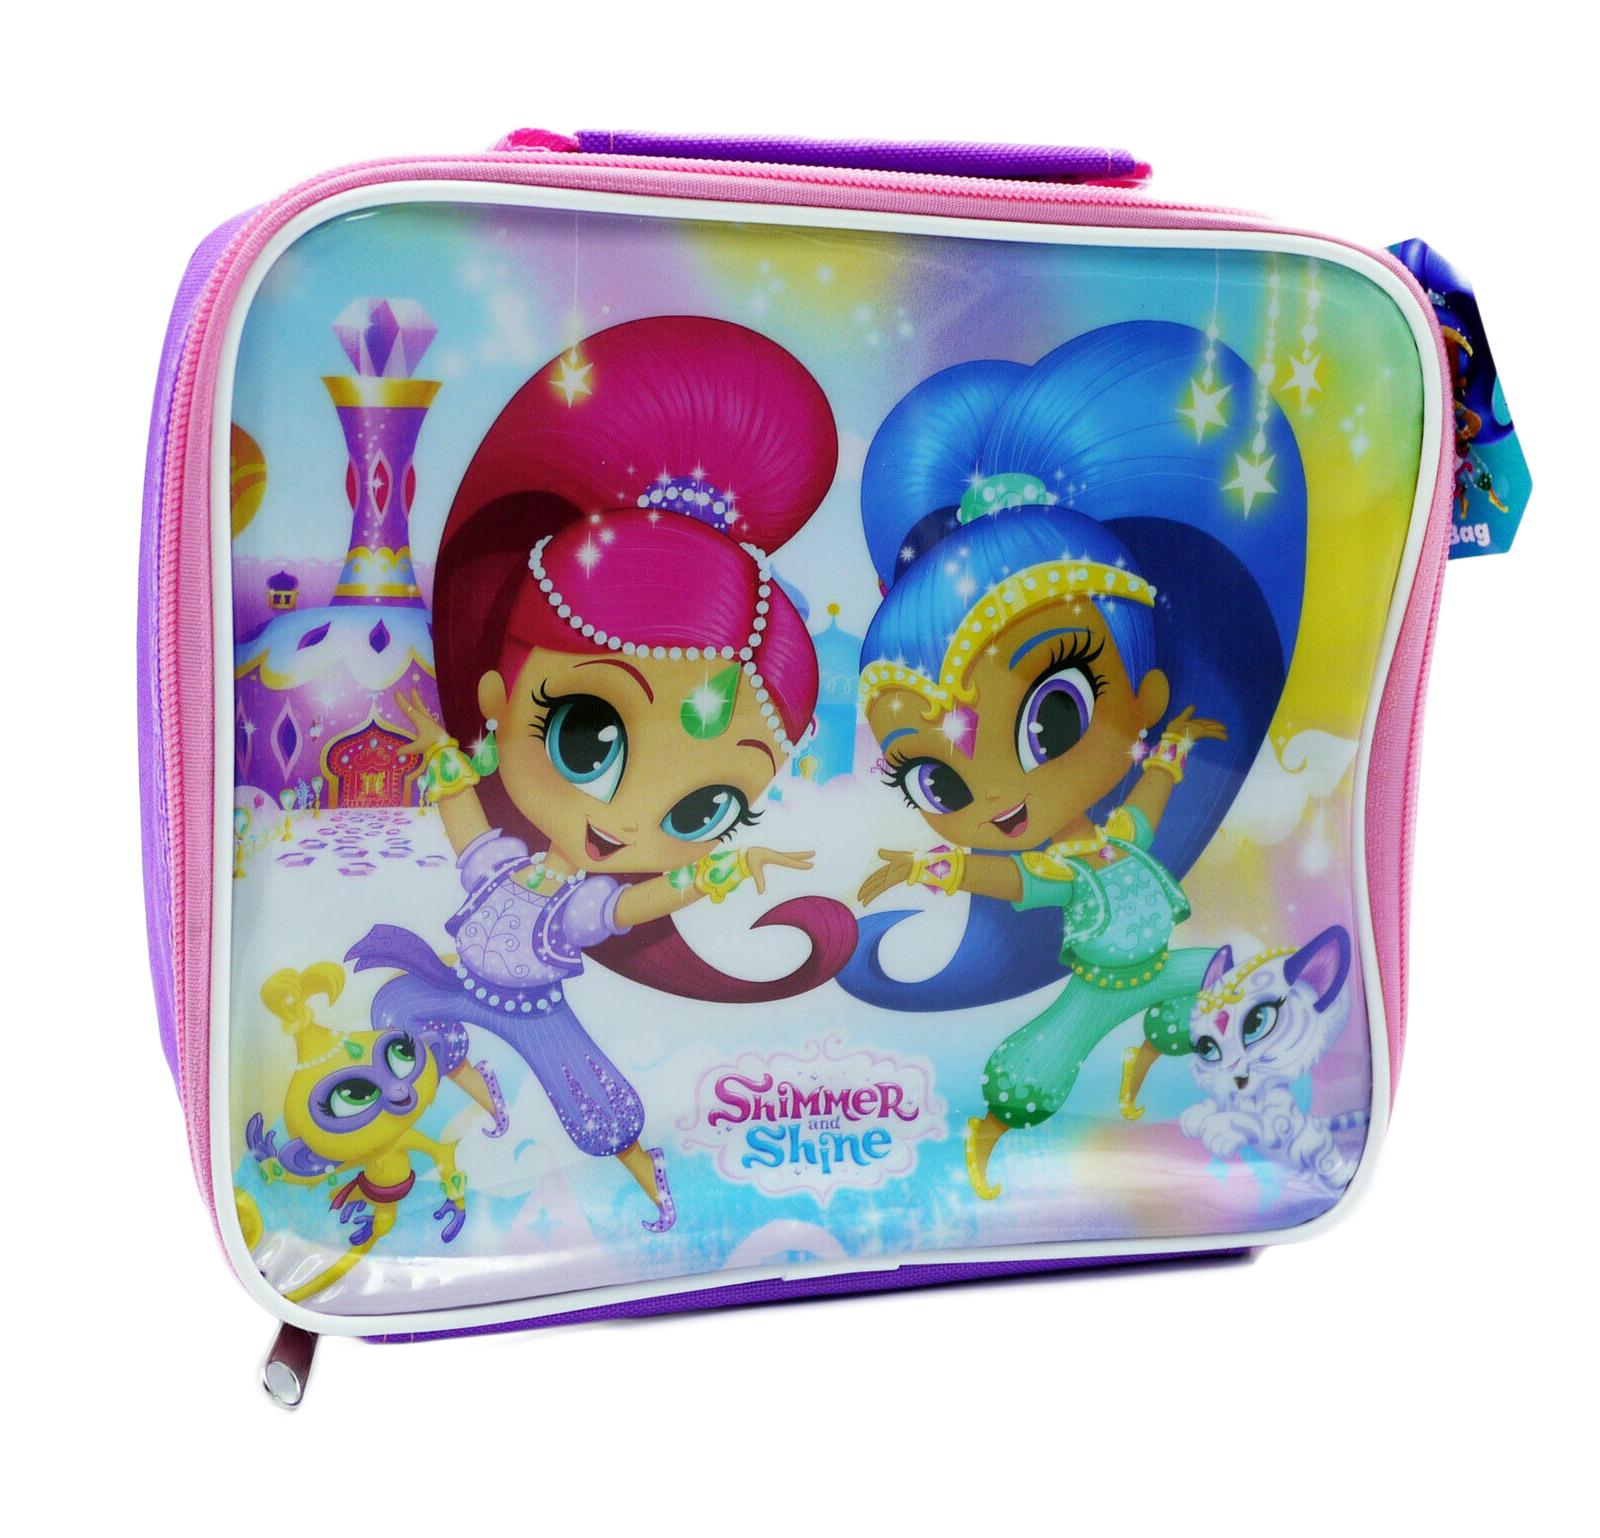 Nickelodeon Shimmer & Shine Lunch Bag